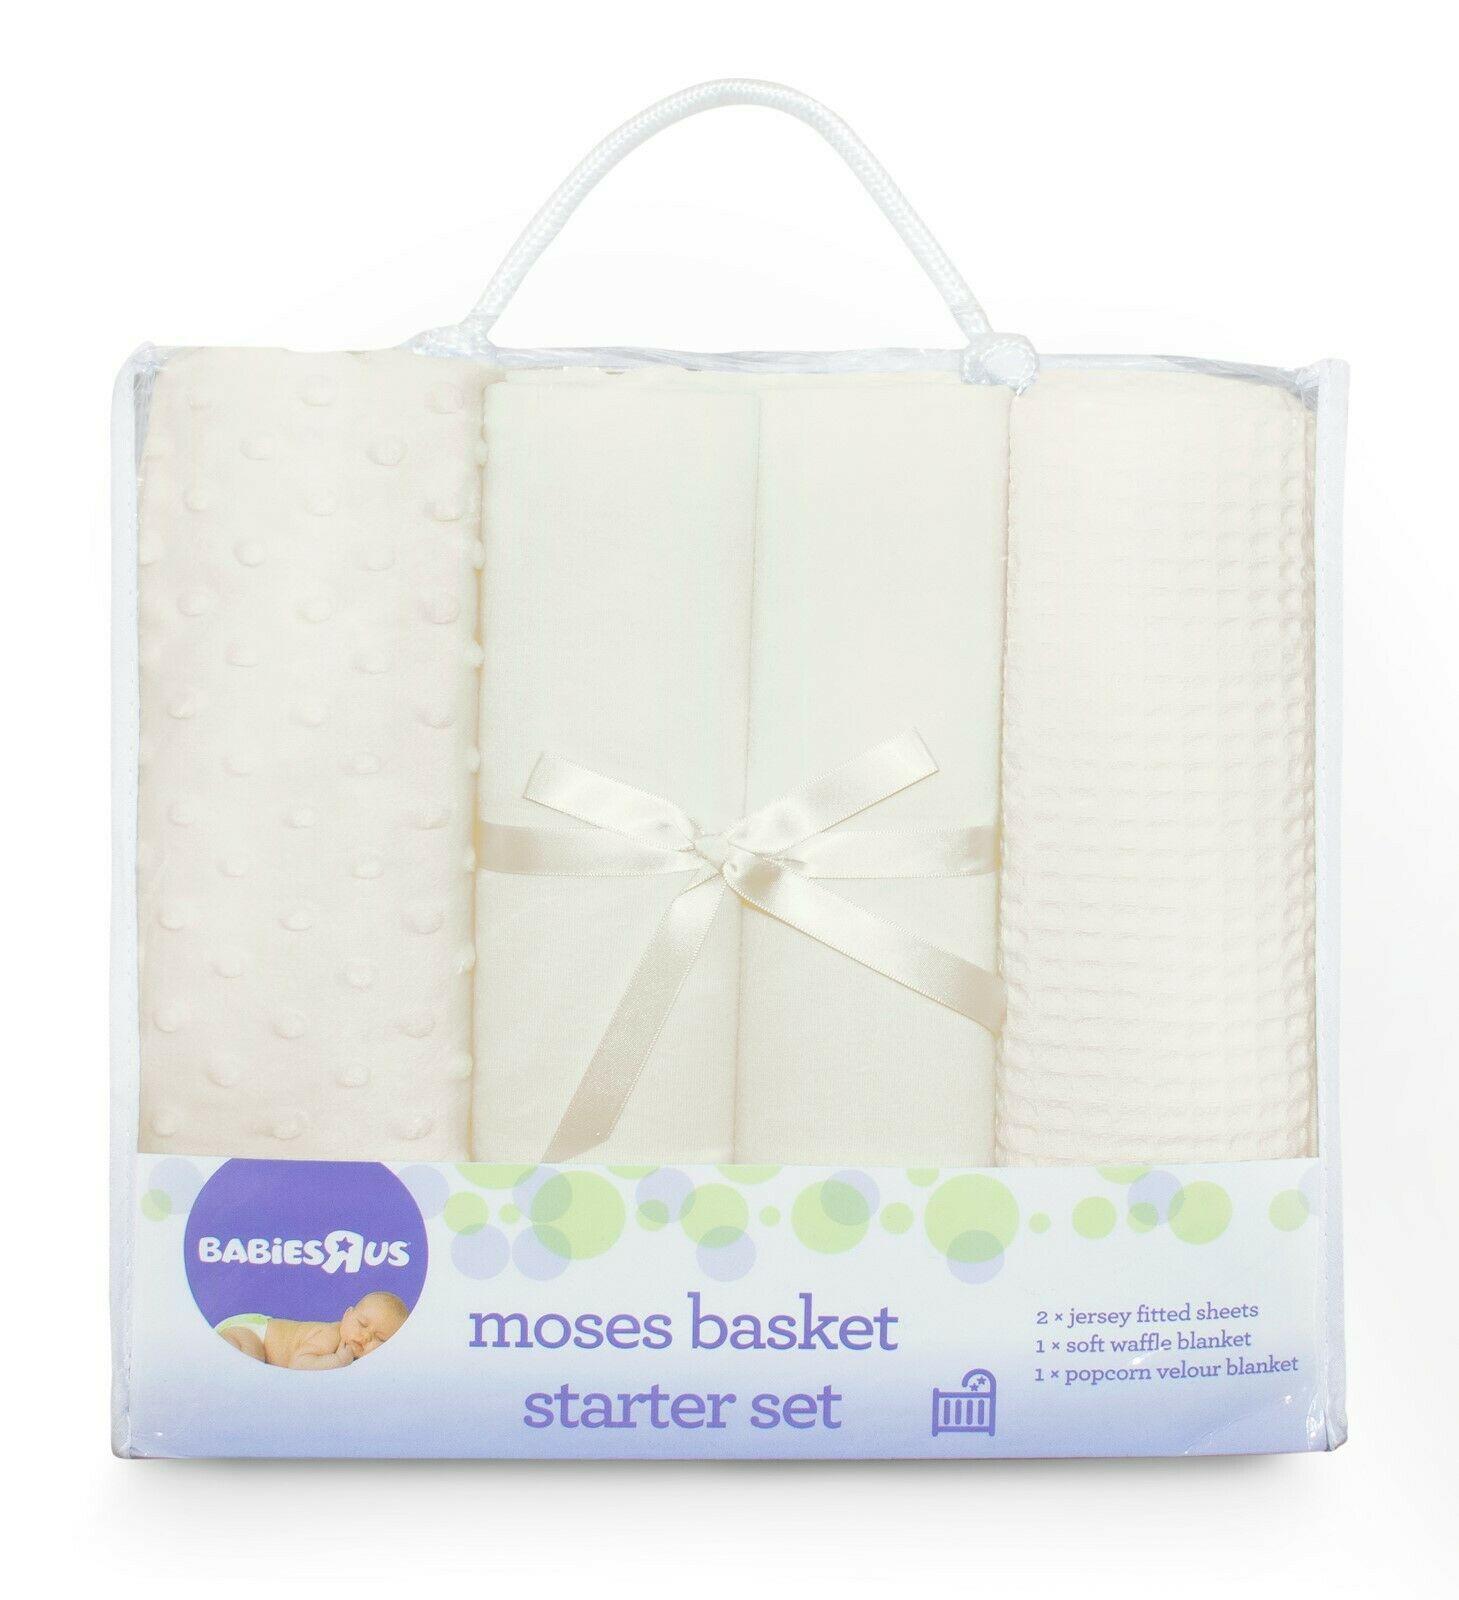 Babies R Us Mothercare 4-Piece pram& crib starter set in cream for £12.90 delivered @ Online4Baby